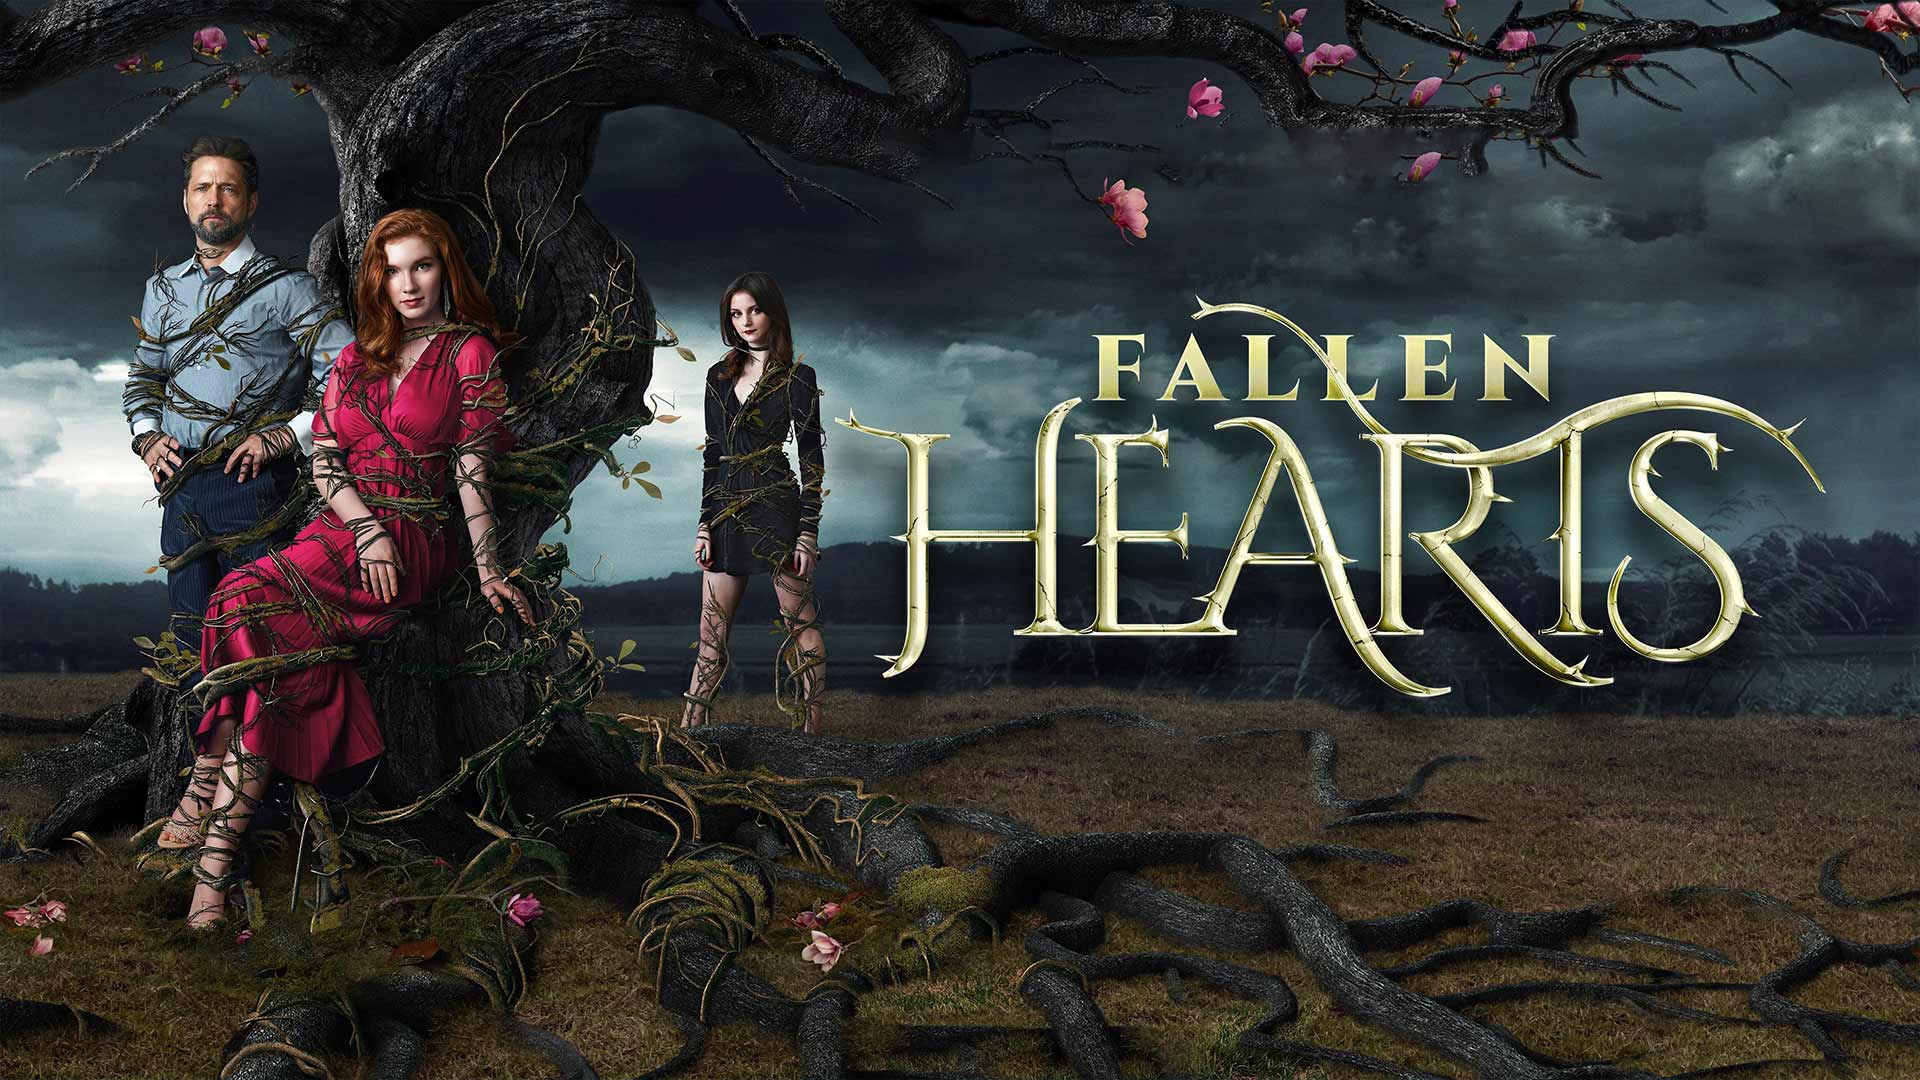 VC Andrews' Fallen Hearts